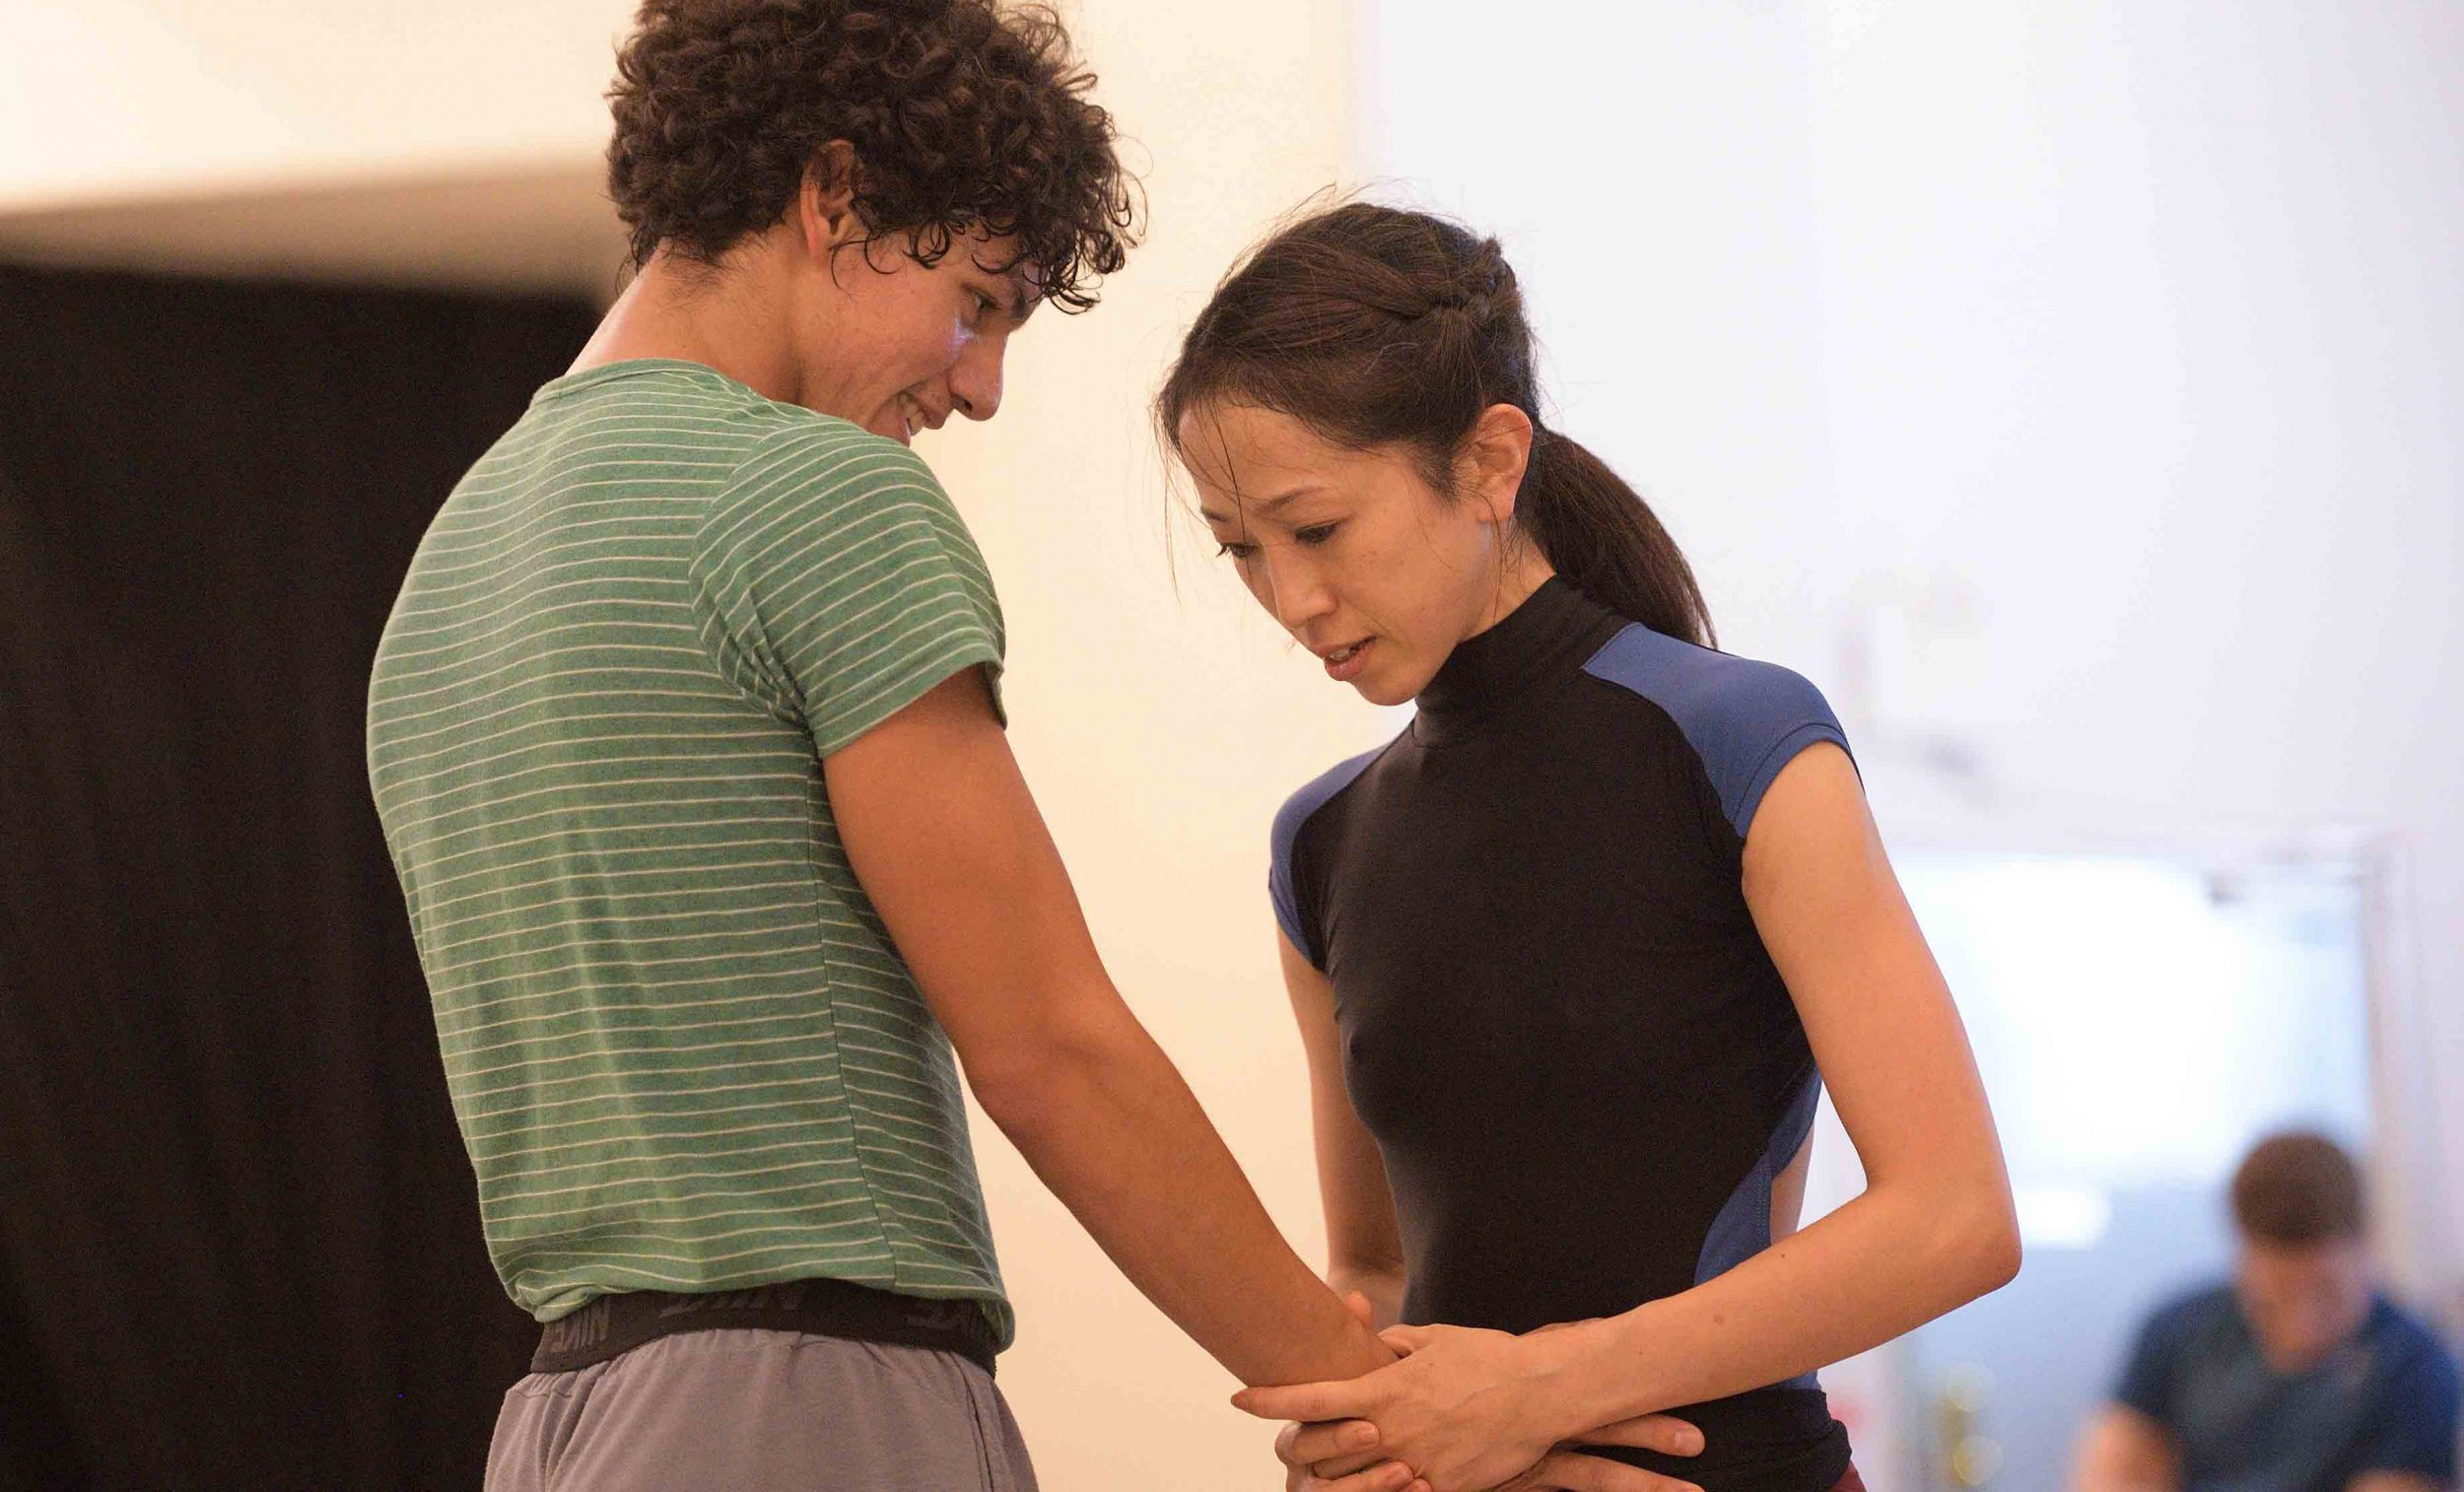 Erina-Takahashi-and-Isaac-Hernadez-rehearsing-Akram-Khan's-Giselle-©-Laurent-Liotardo-(1)